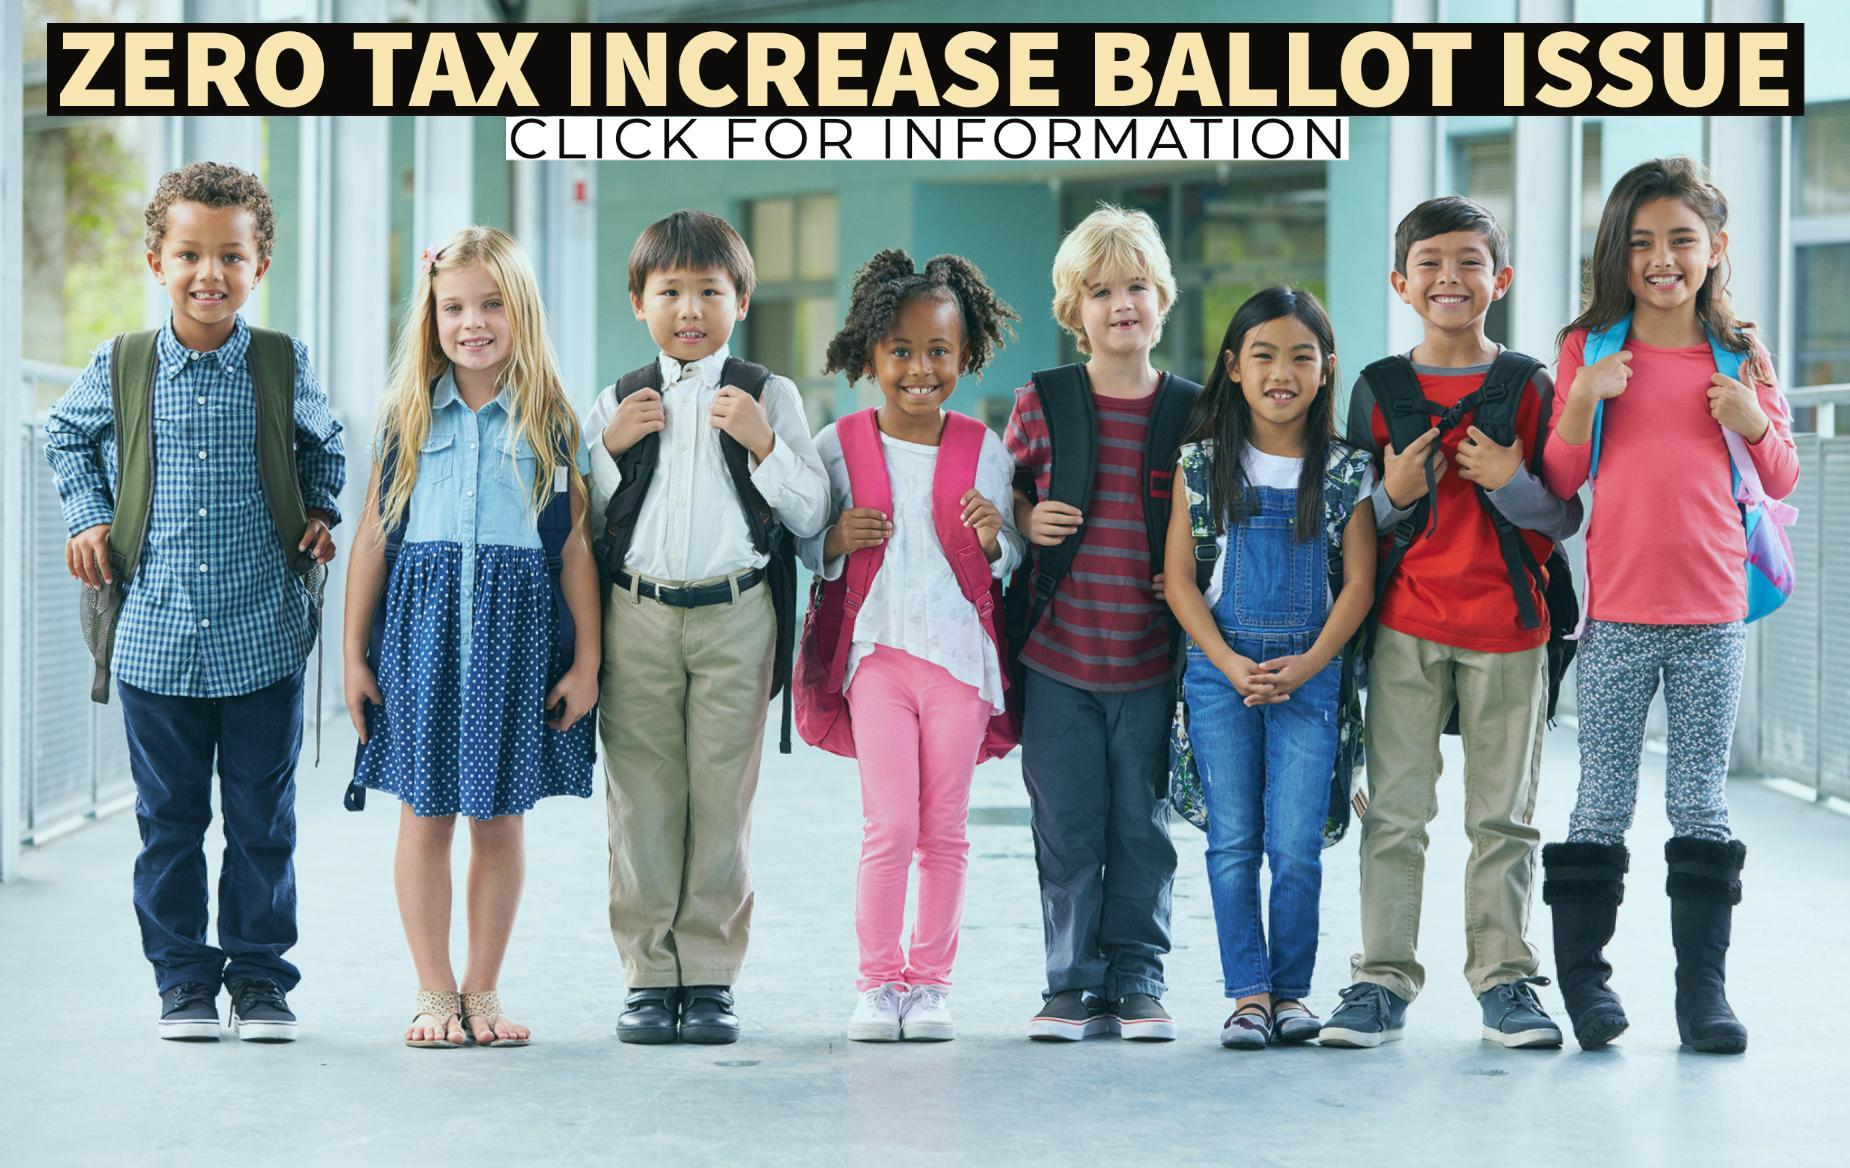 Zero Tax Increase Ballot Issue